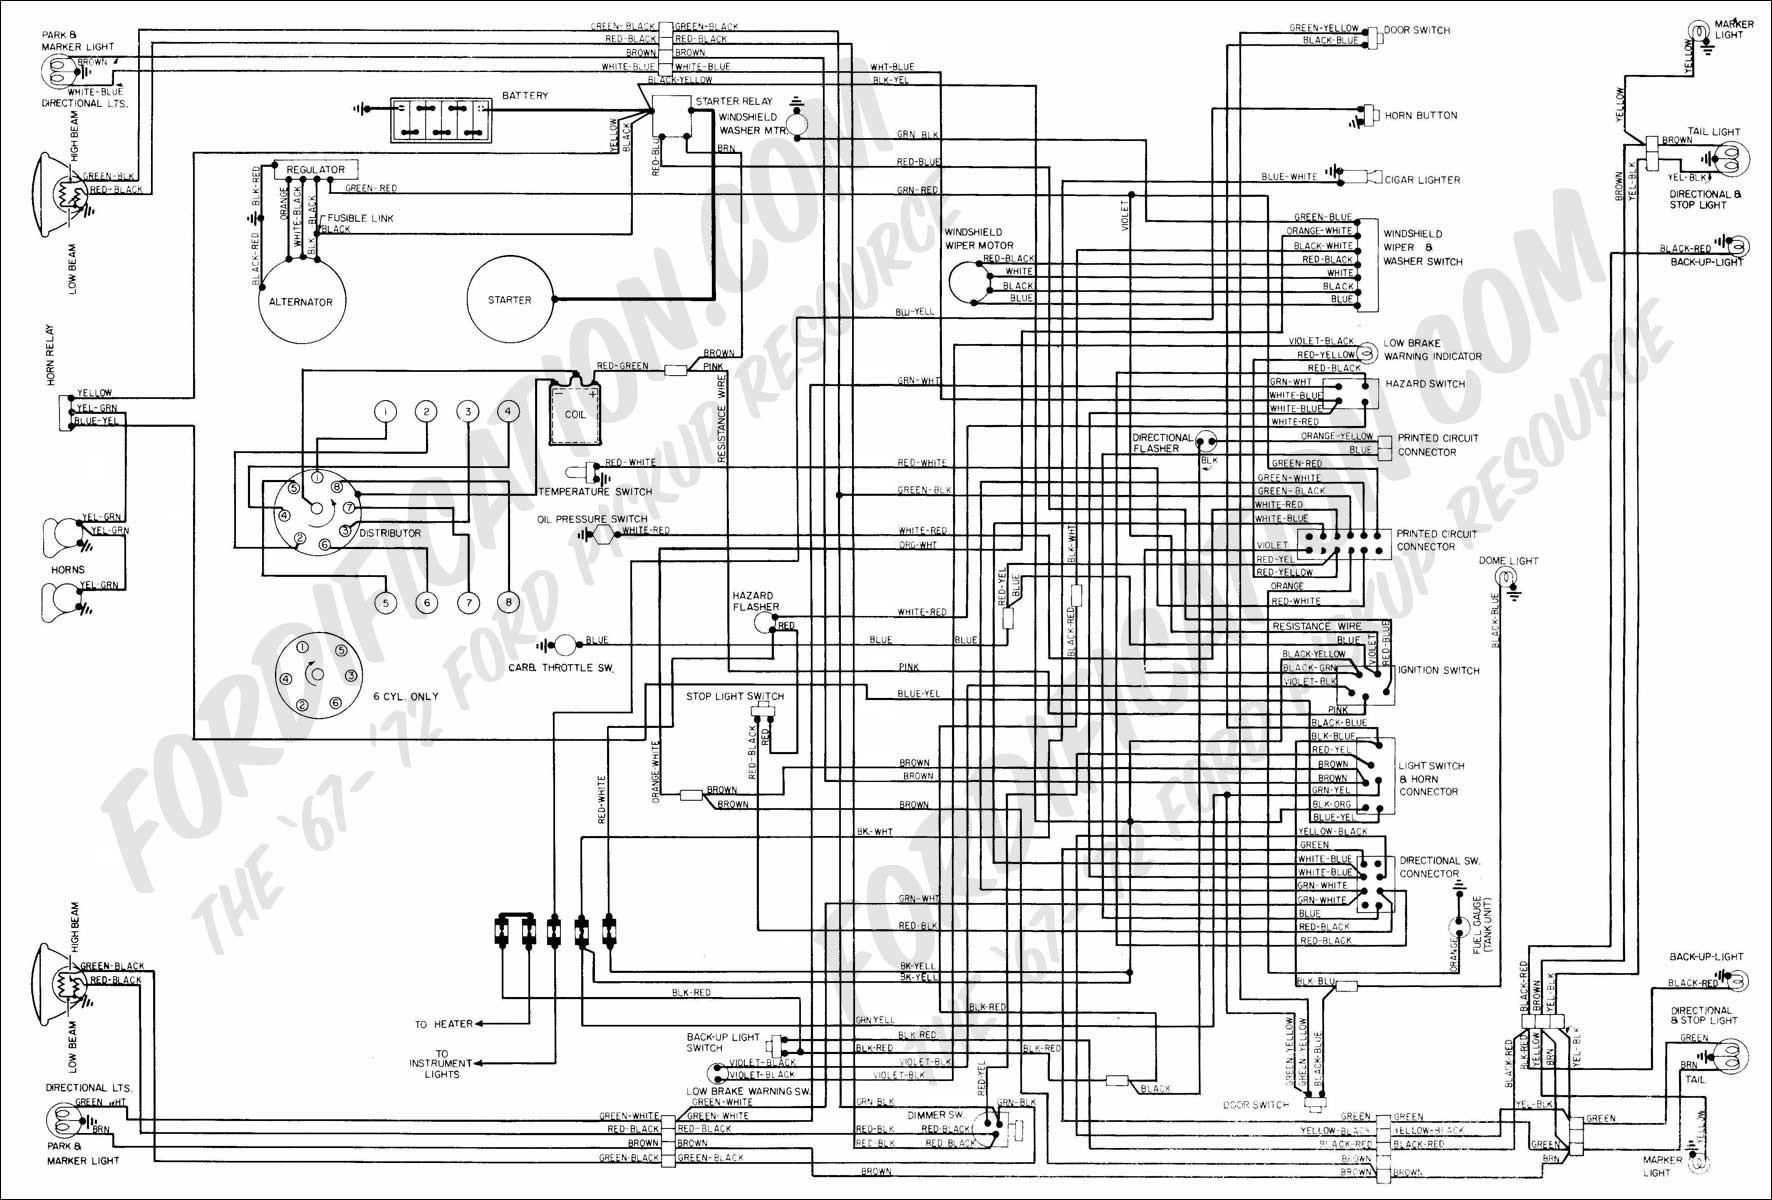 1996 ford windstar fuse diagram ski doo snowmobile parts 2003 wiring 1997 plete